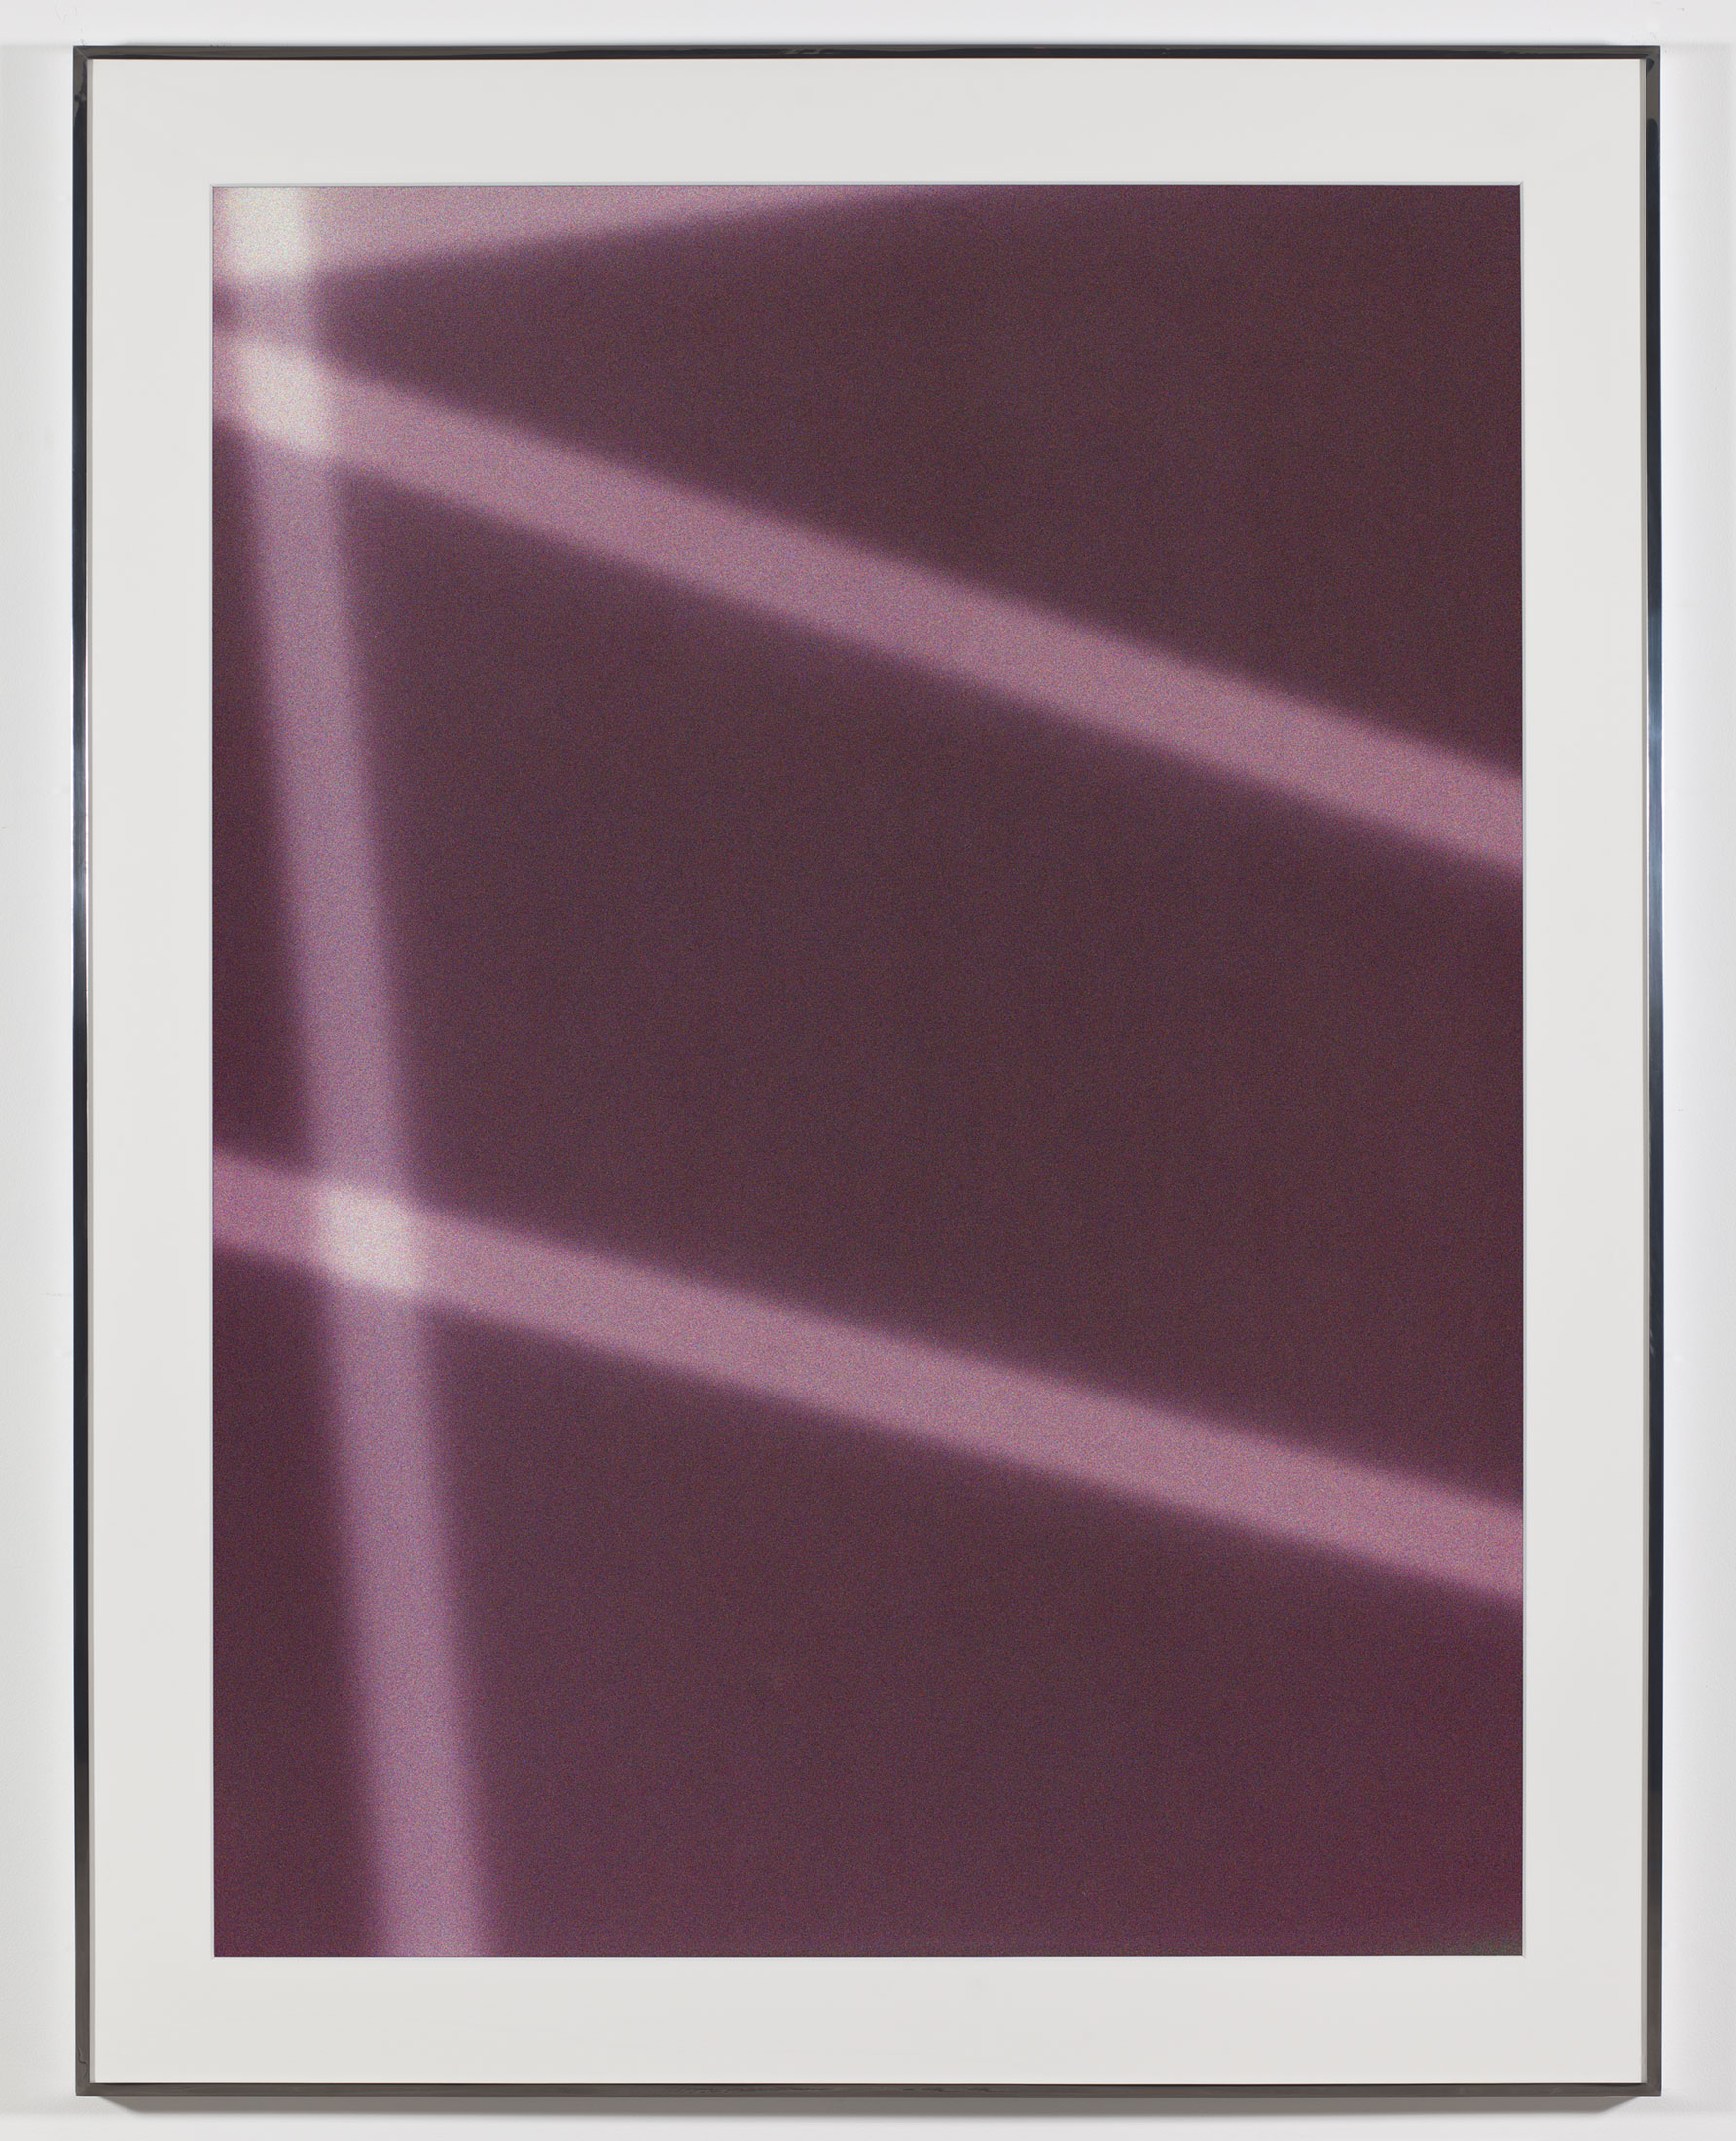 Transparency (Negative) [Kodak Portra 400NC Em. No. 2001: May 8–July 18, 2007 LAX/FRA FRA/JFK LGA/IAD IAD/ORD]    2009   Epson Ultrachrome K3 archival ink jet print on Museo Silver Rag Paper  68 x 52 1/4 inches   FIVE, 2009